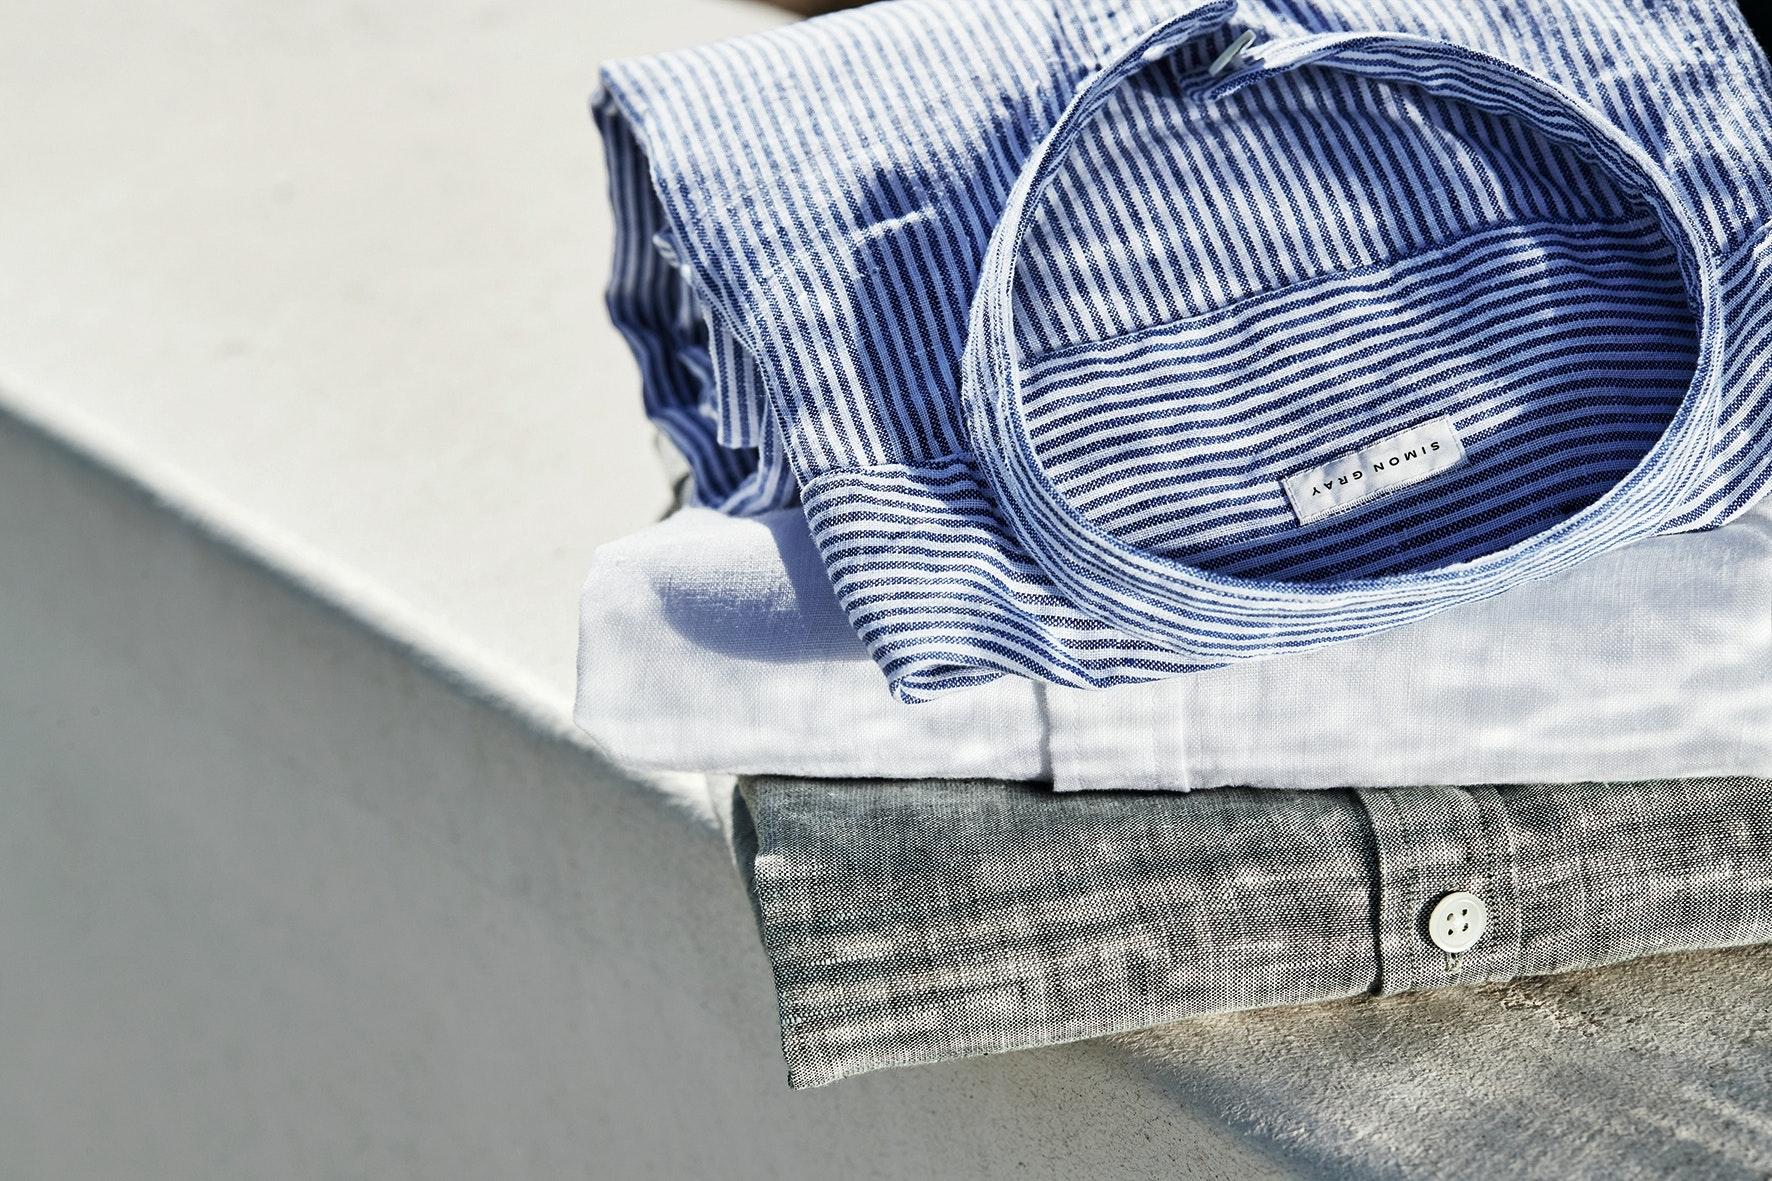 Leinenhemden, Simon Grey, Summer Styles 2018, Menswear, Lodenfrey, Munich